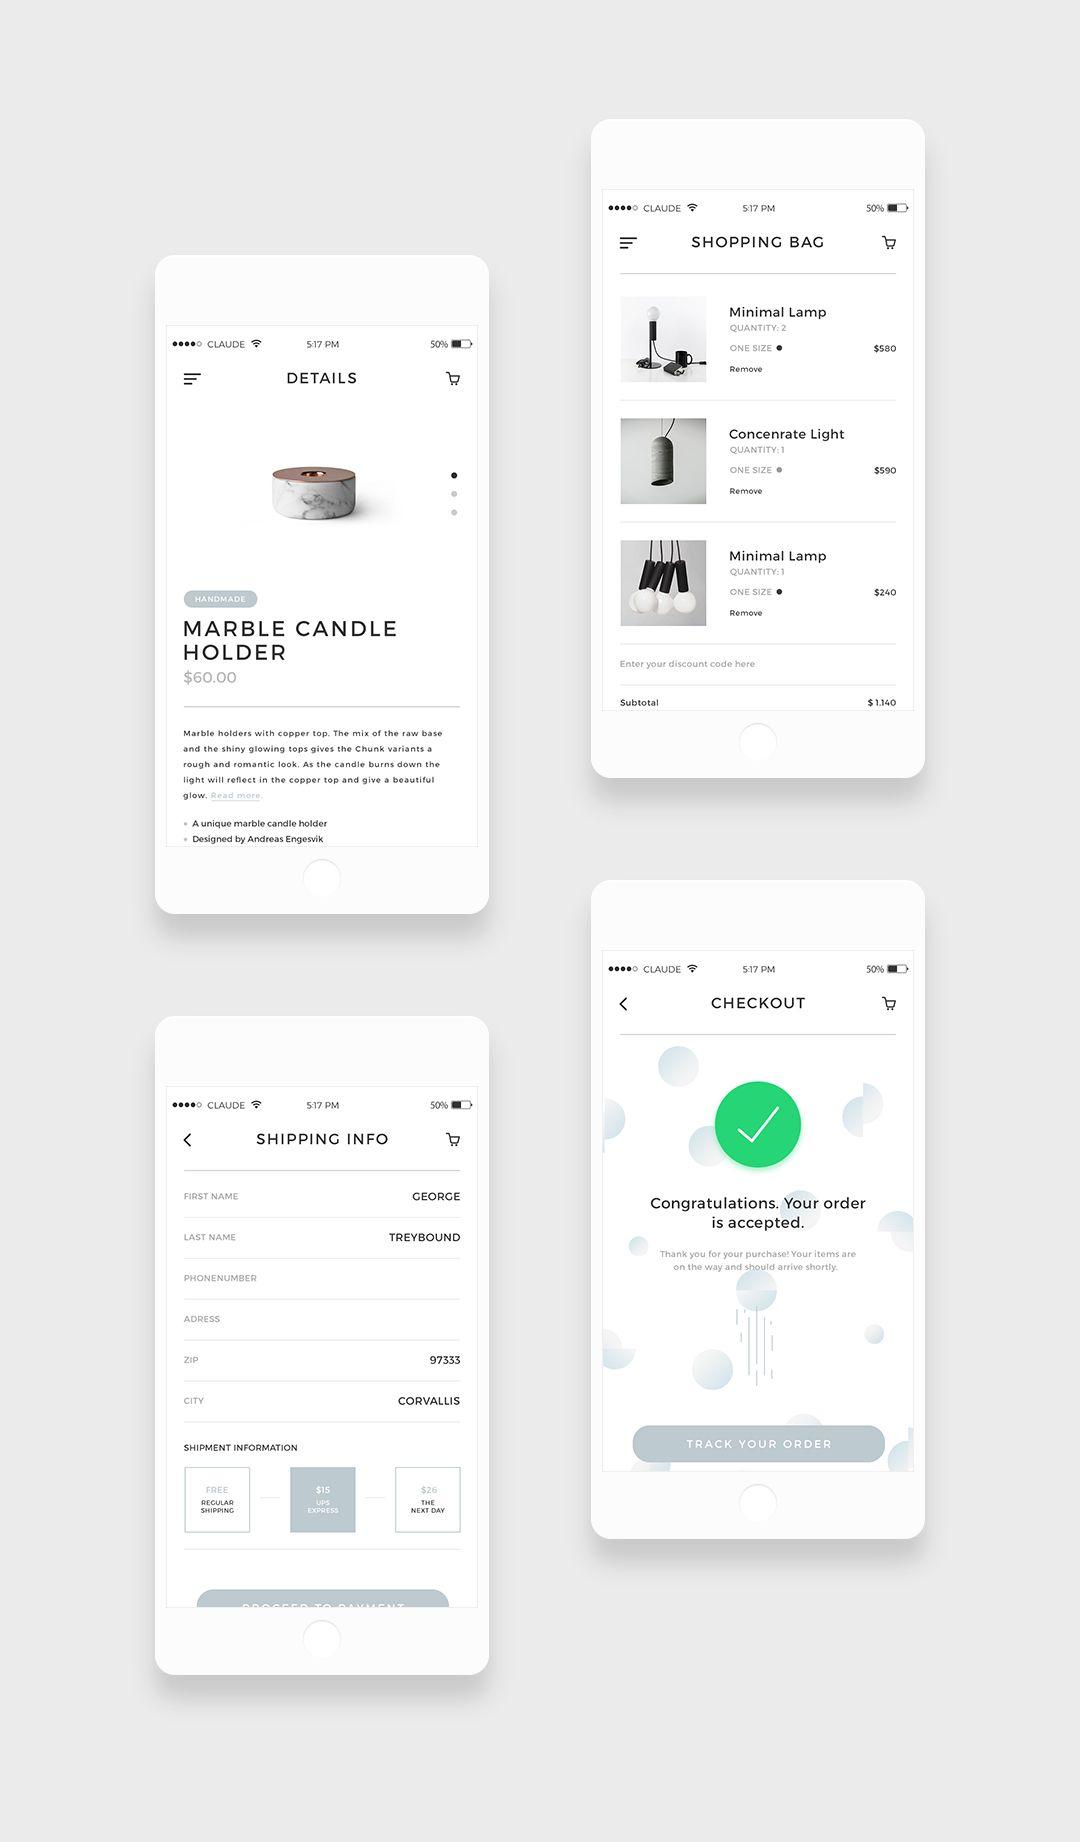 Dribbble social app ui design jpg by ramotion - Mobile App Design Dribbble Attachment Jpg By Alim Maasoglu